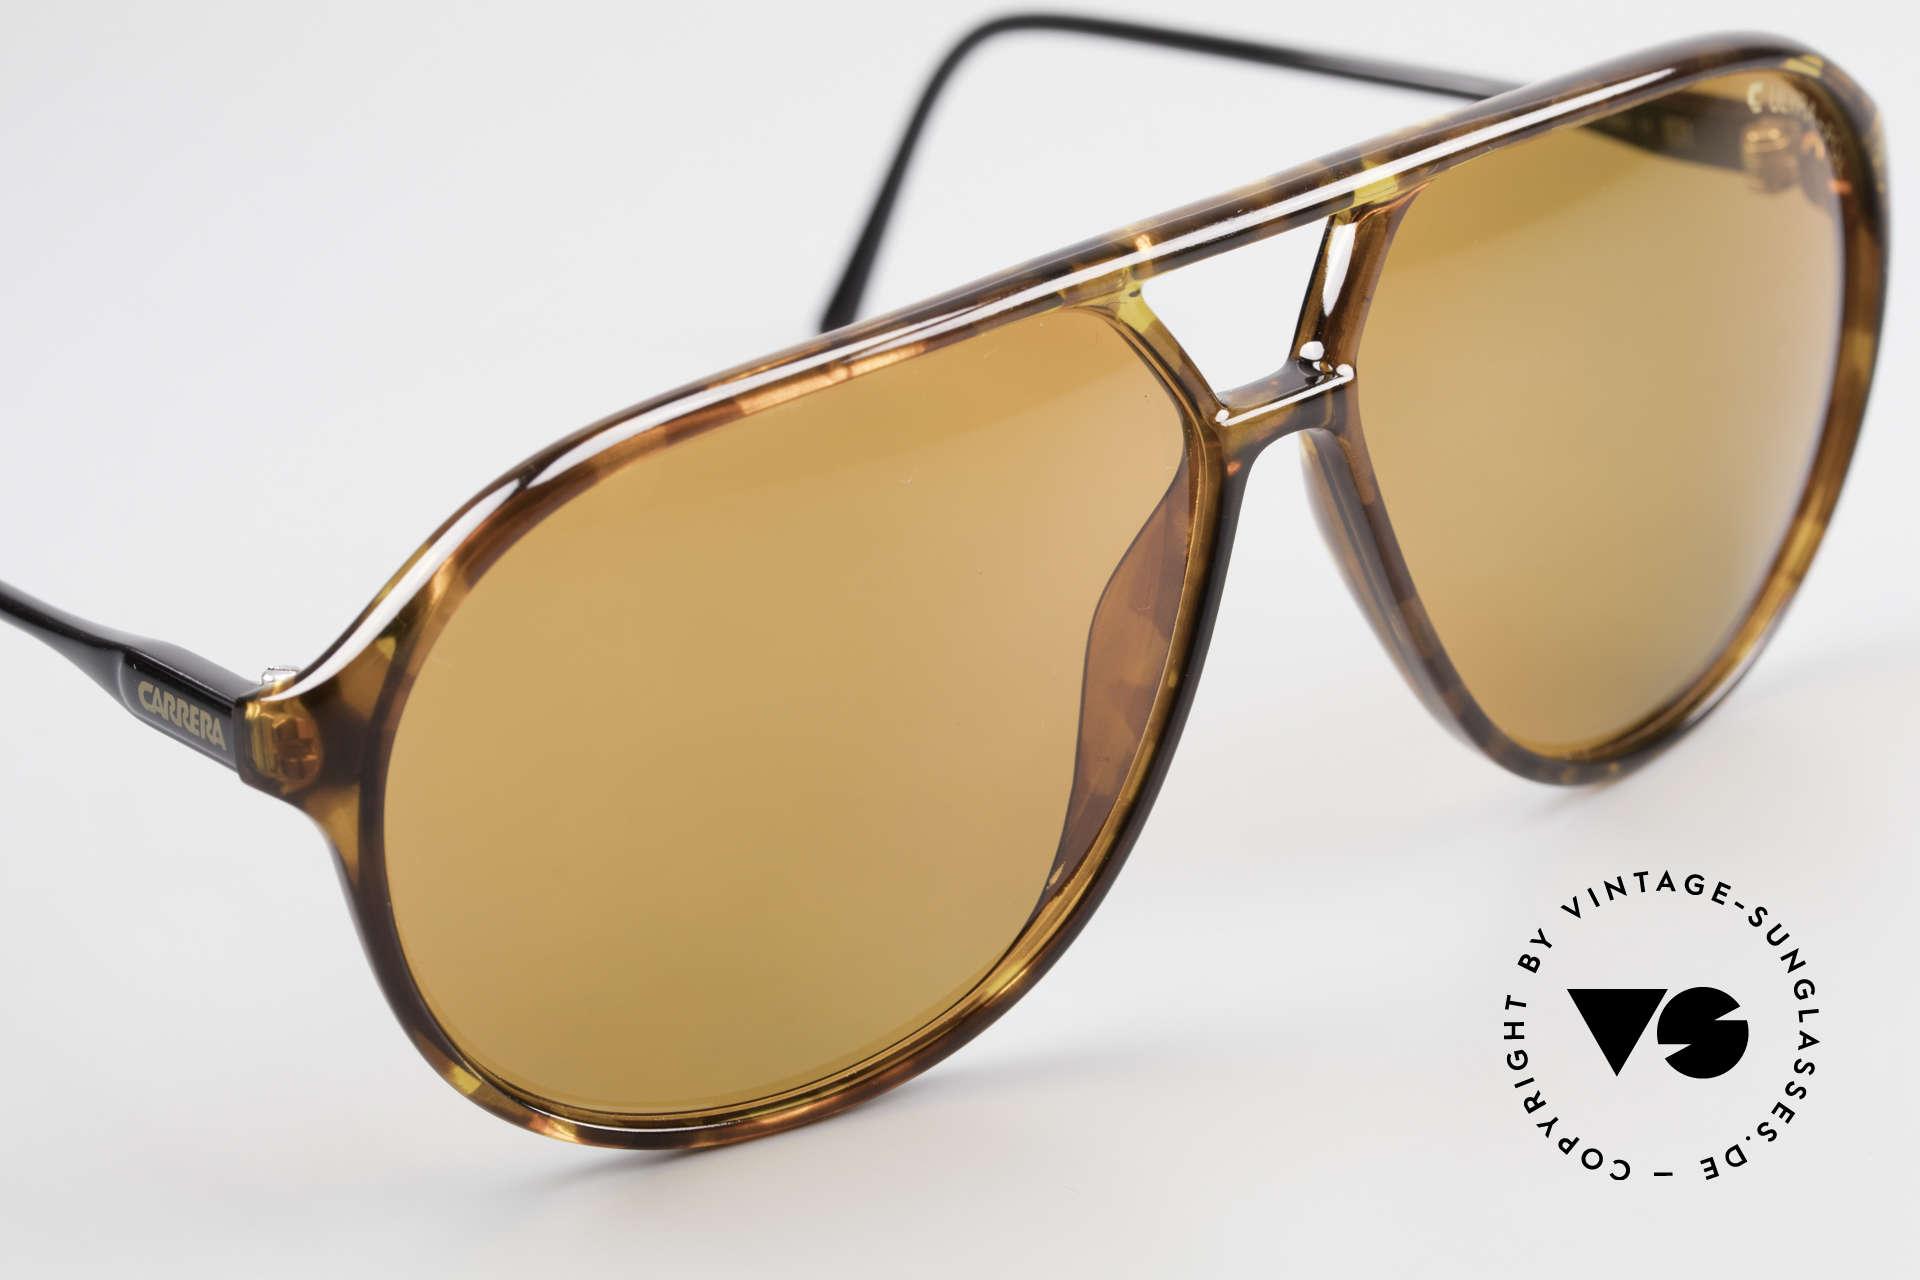 Carrera 5425 Polarized Sunglasses Aviator, unworn, NOS (like all our rare vintage 80's sunglasses), Made for Men